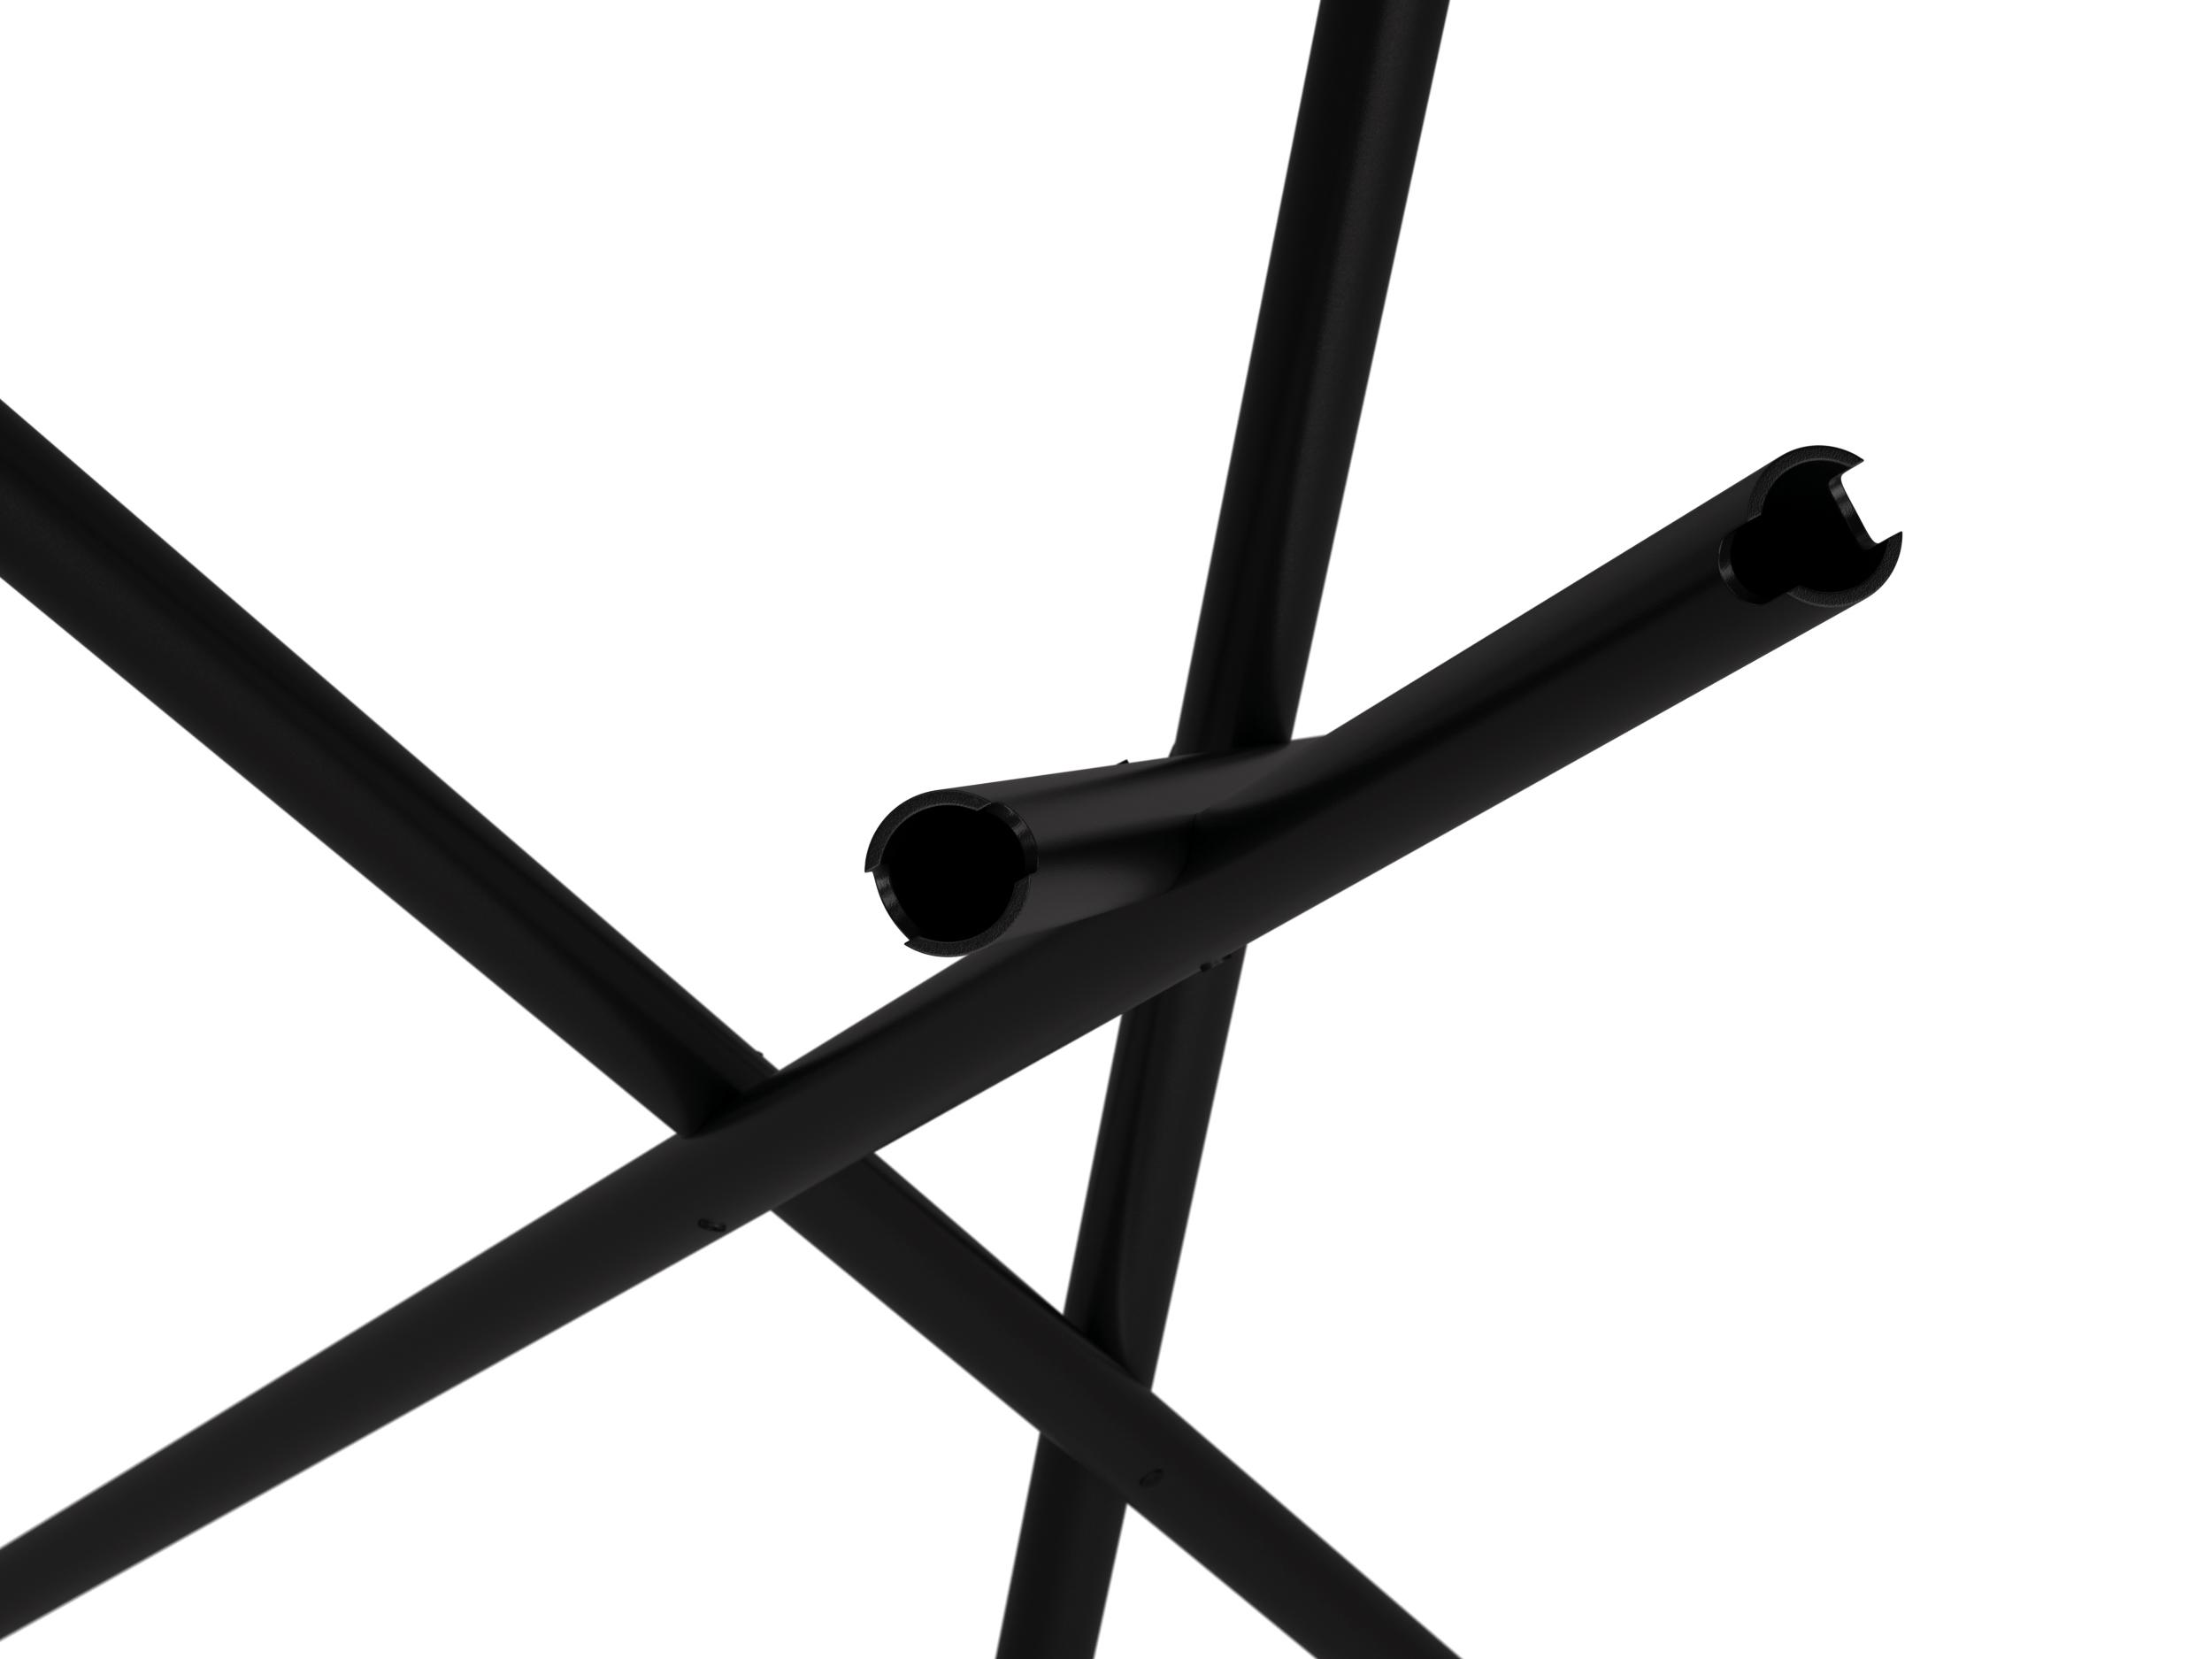 140804-Hash-Black-Detail-05.jpg